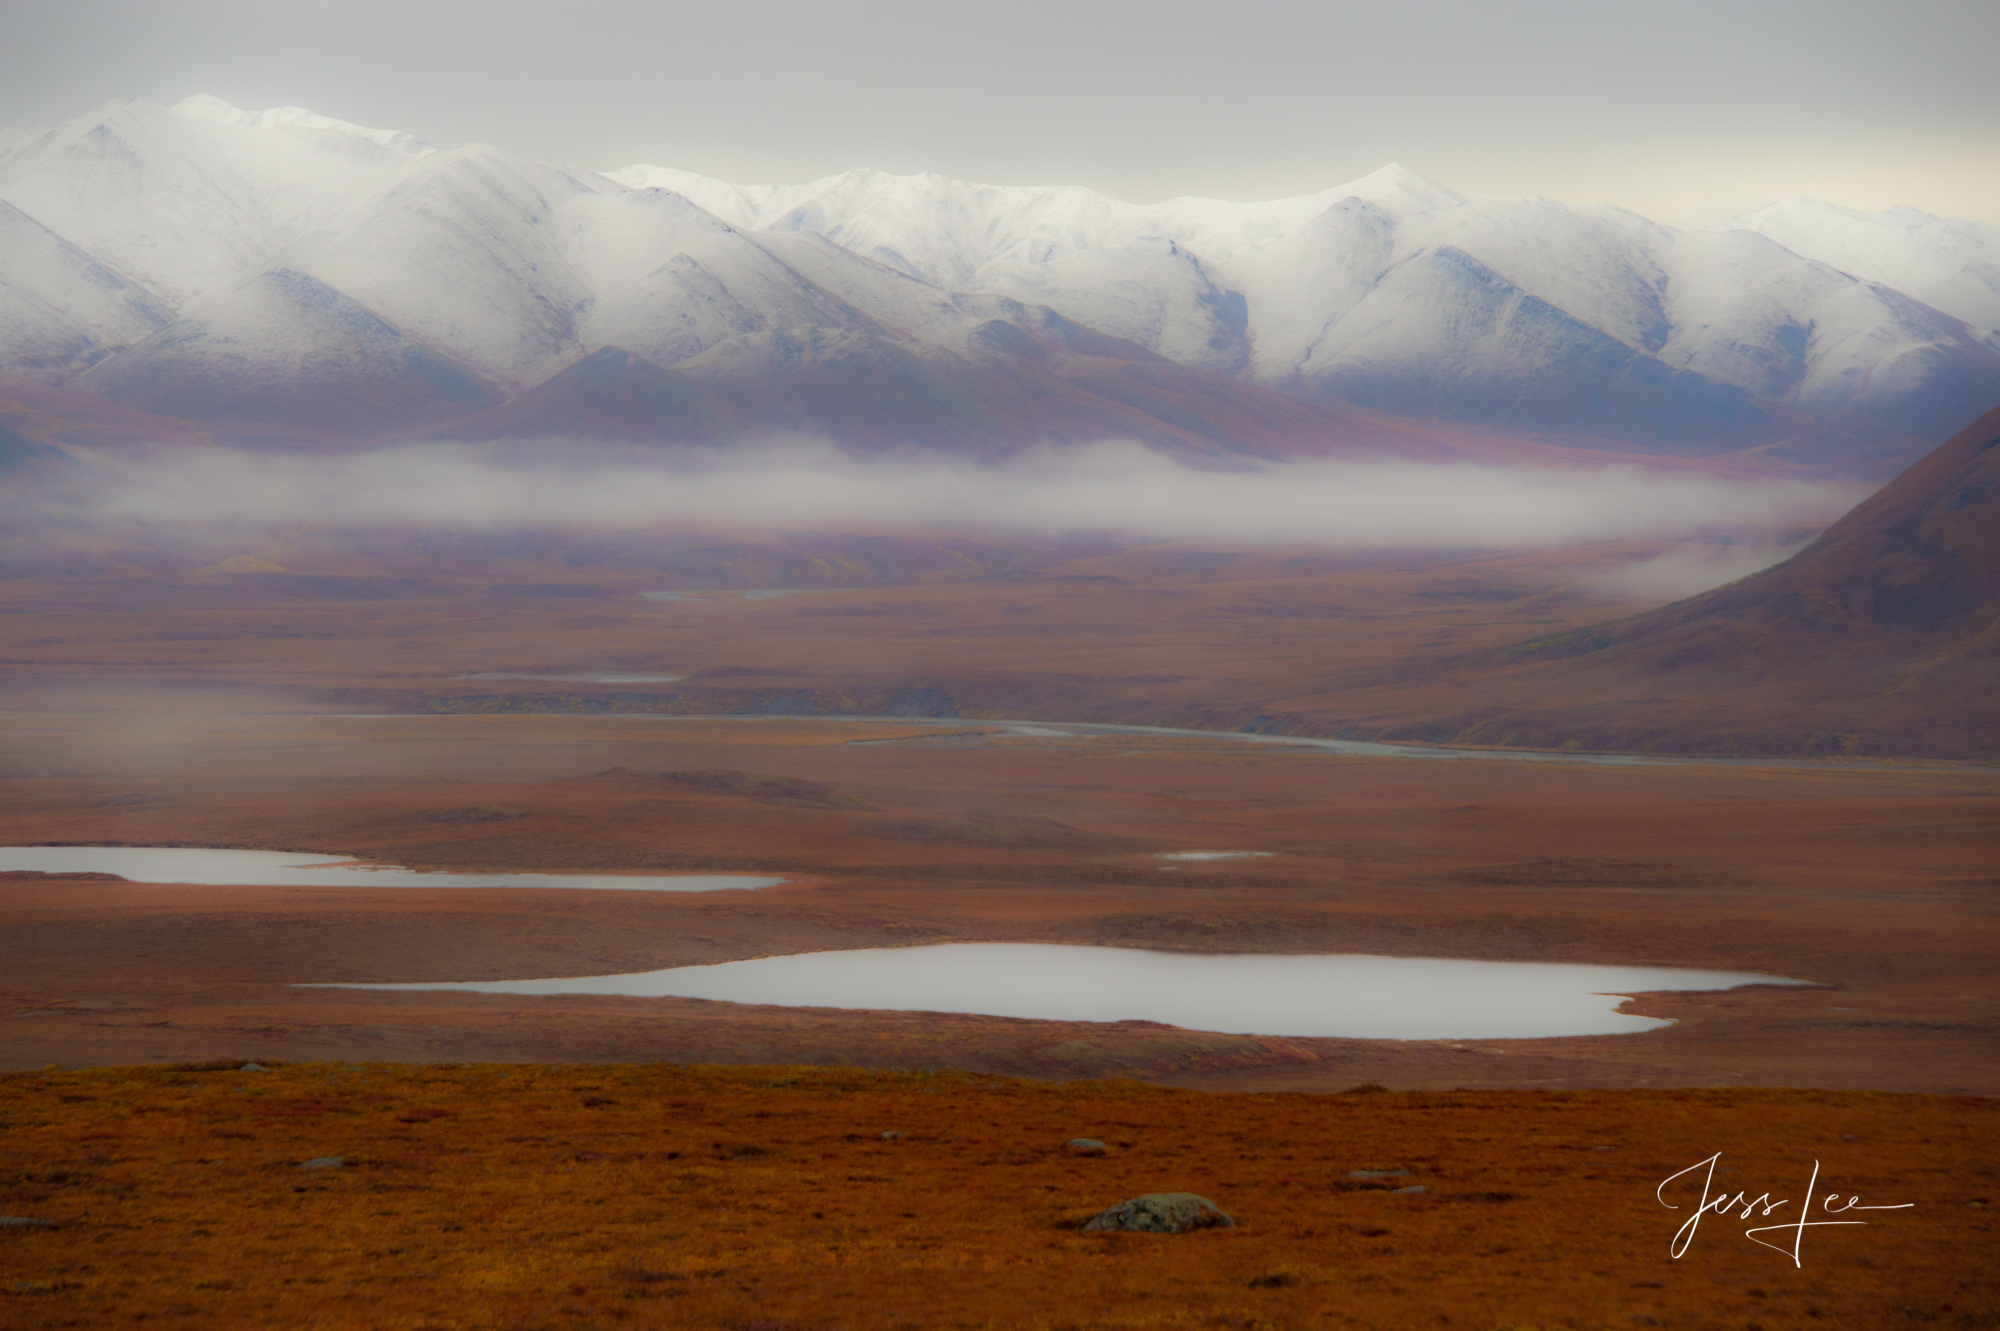 Fog covers the wetlands in Alaska's Arctic tundra.